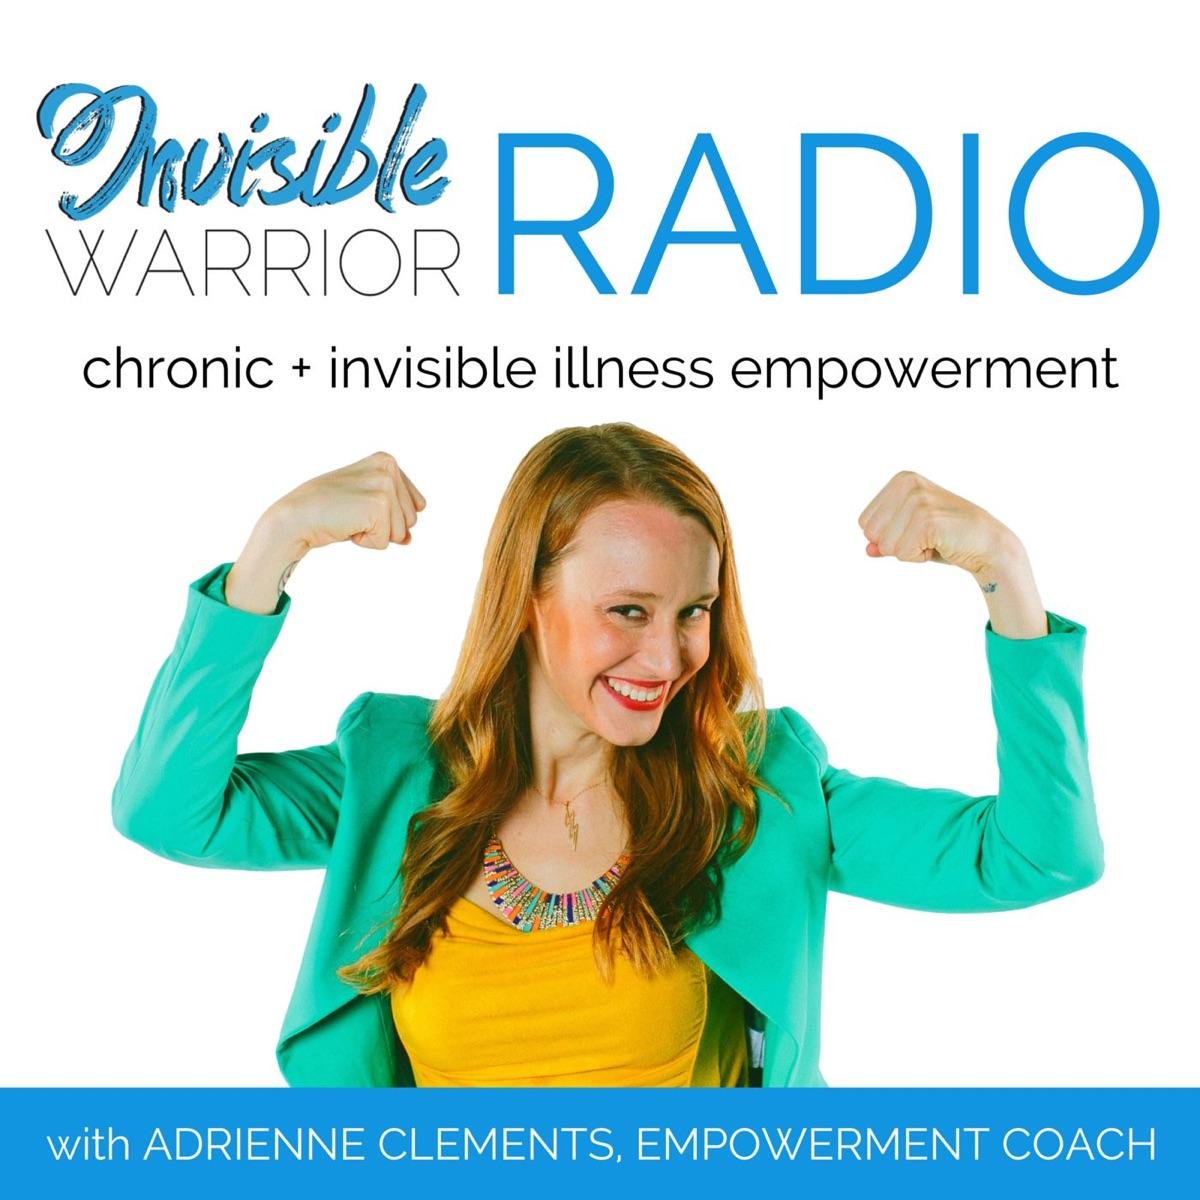 Invisible Warrior Radio - Chronic Illness Support